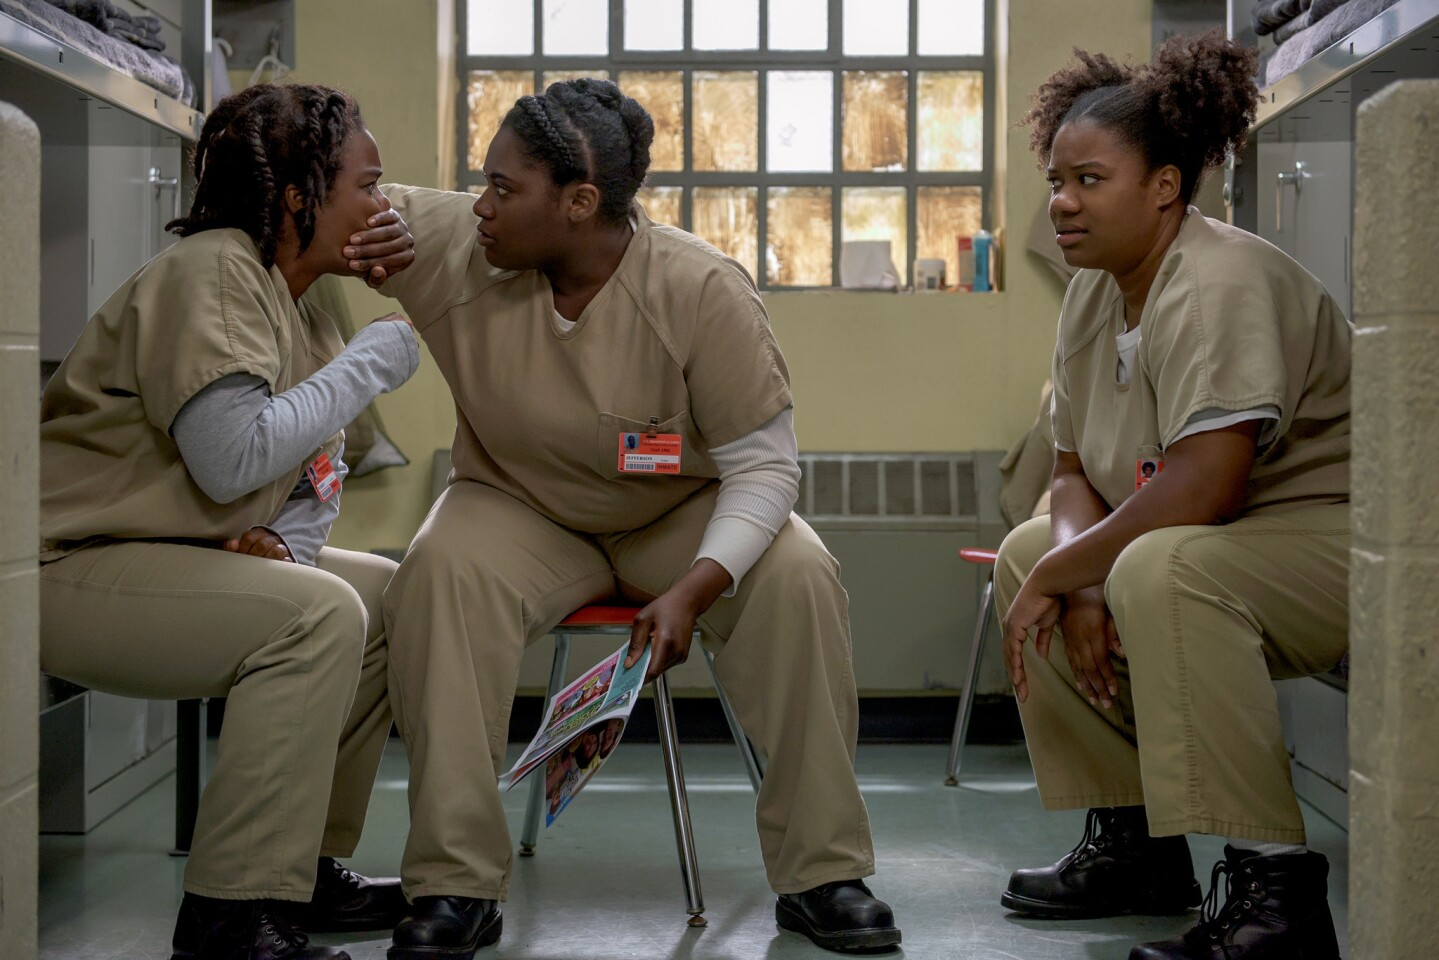 'Orange Is the New Black' Season 4